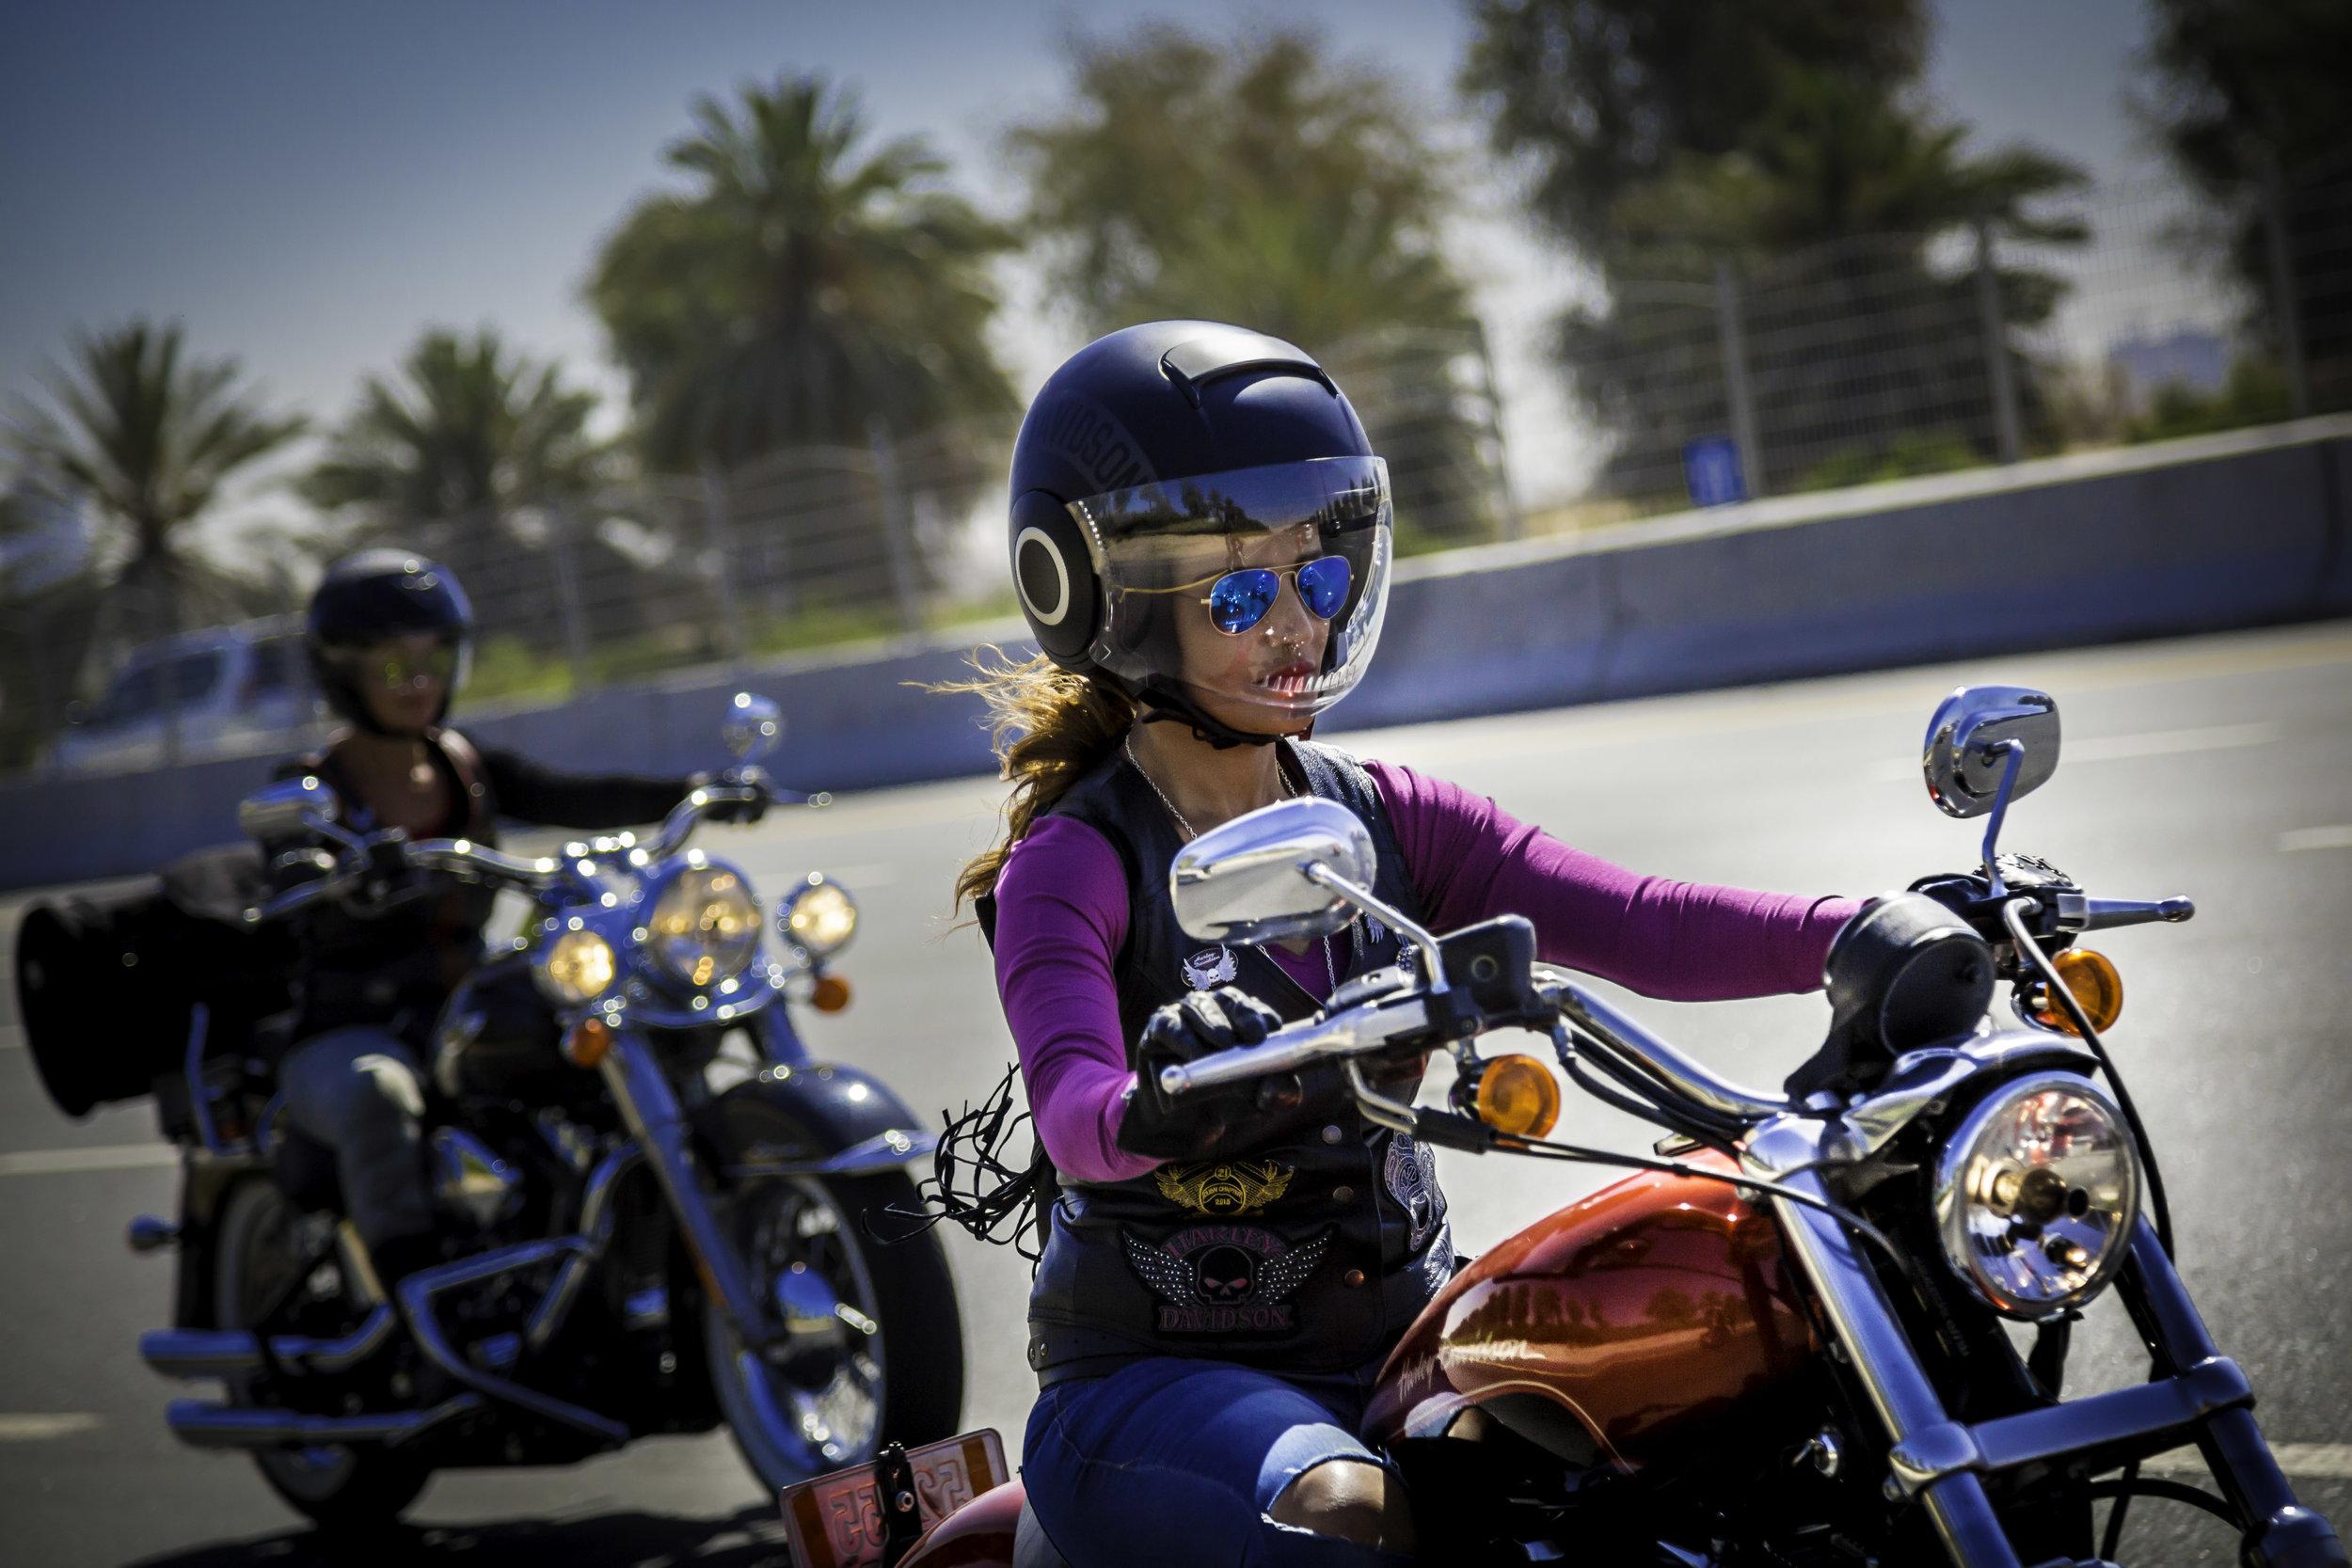 Dubai Ladies of Harley riders riding back to Dubai after marking International Female Ride Day.jpg